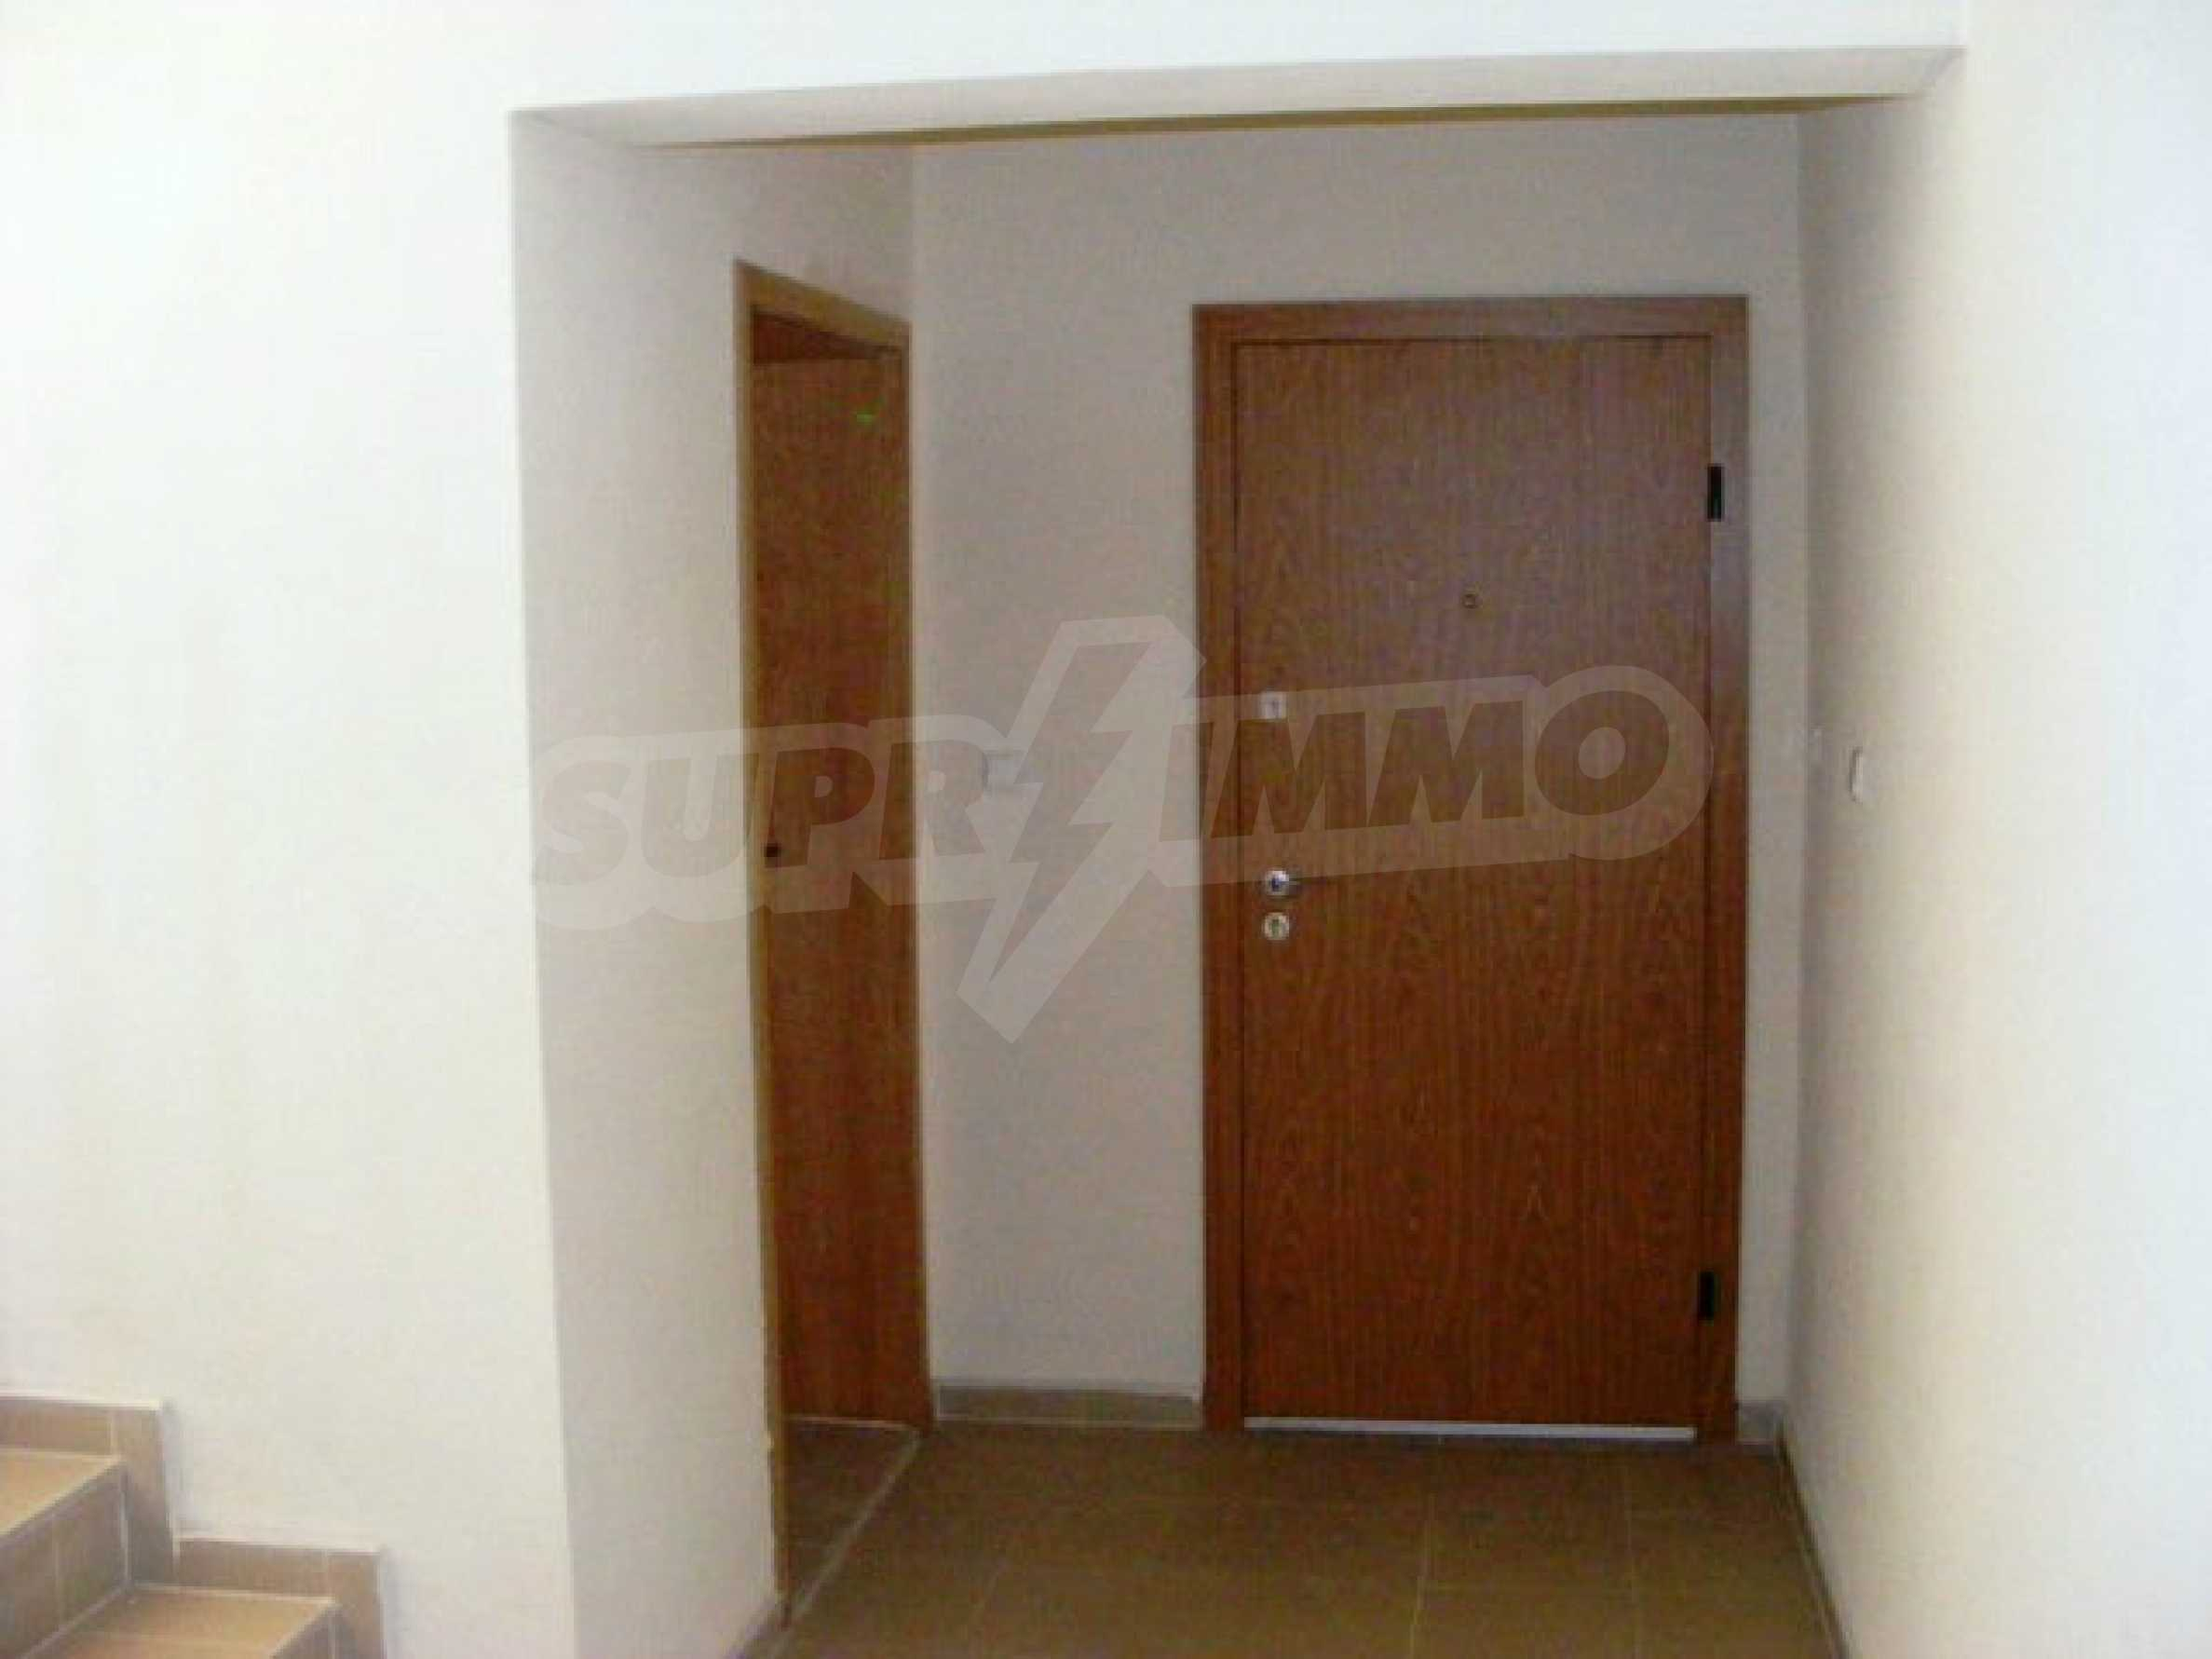 Aldo Wohnung 23